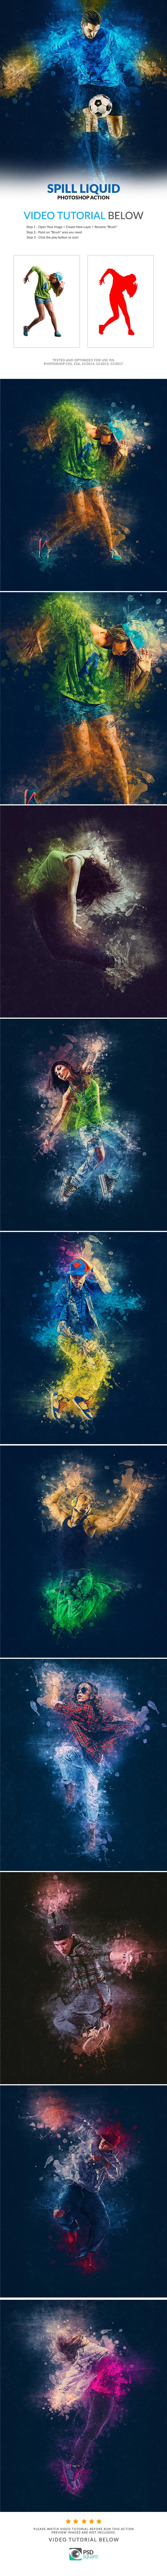 GraphicRiver Spill Liquid Photoshop Action 20390199